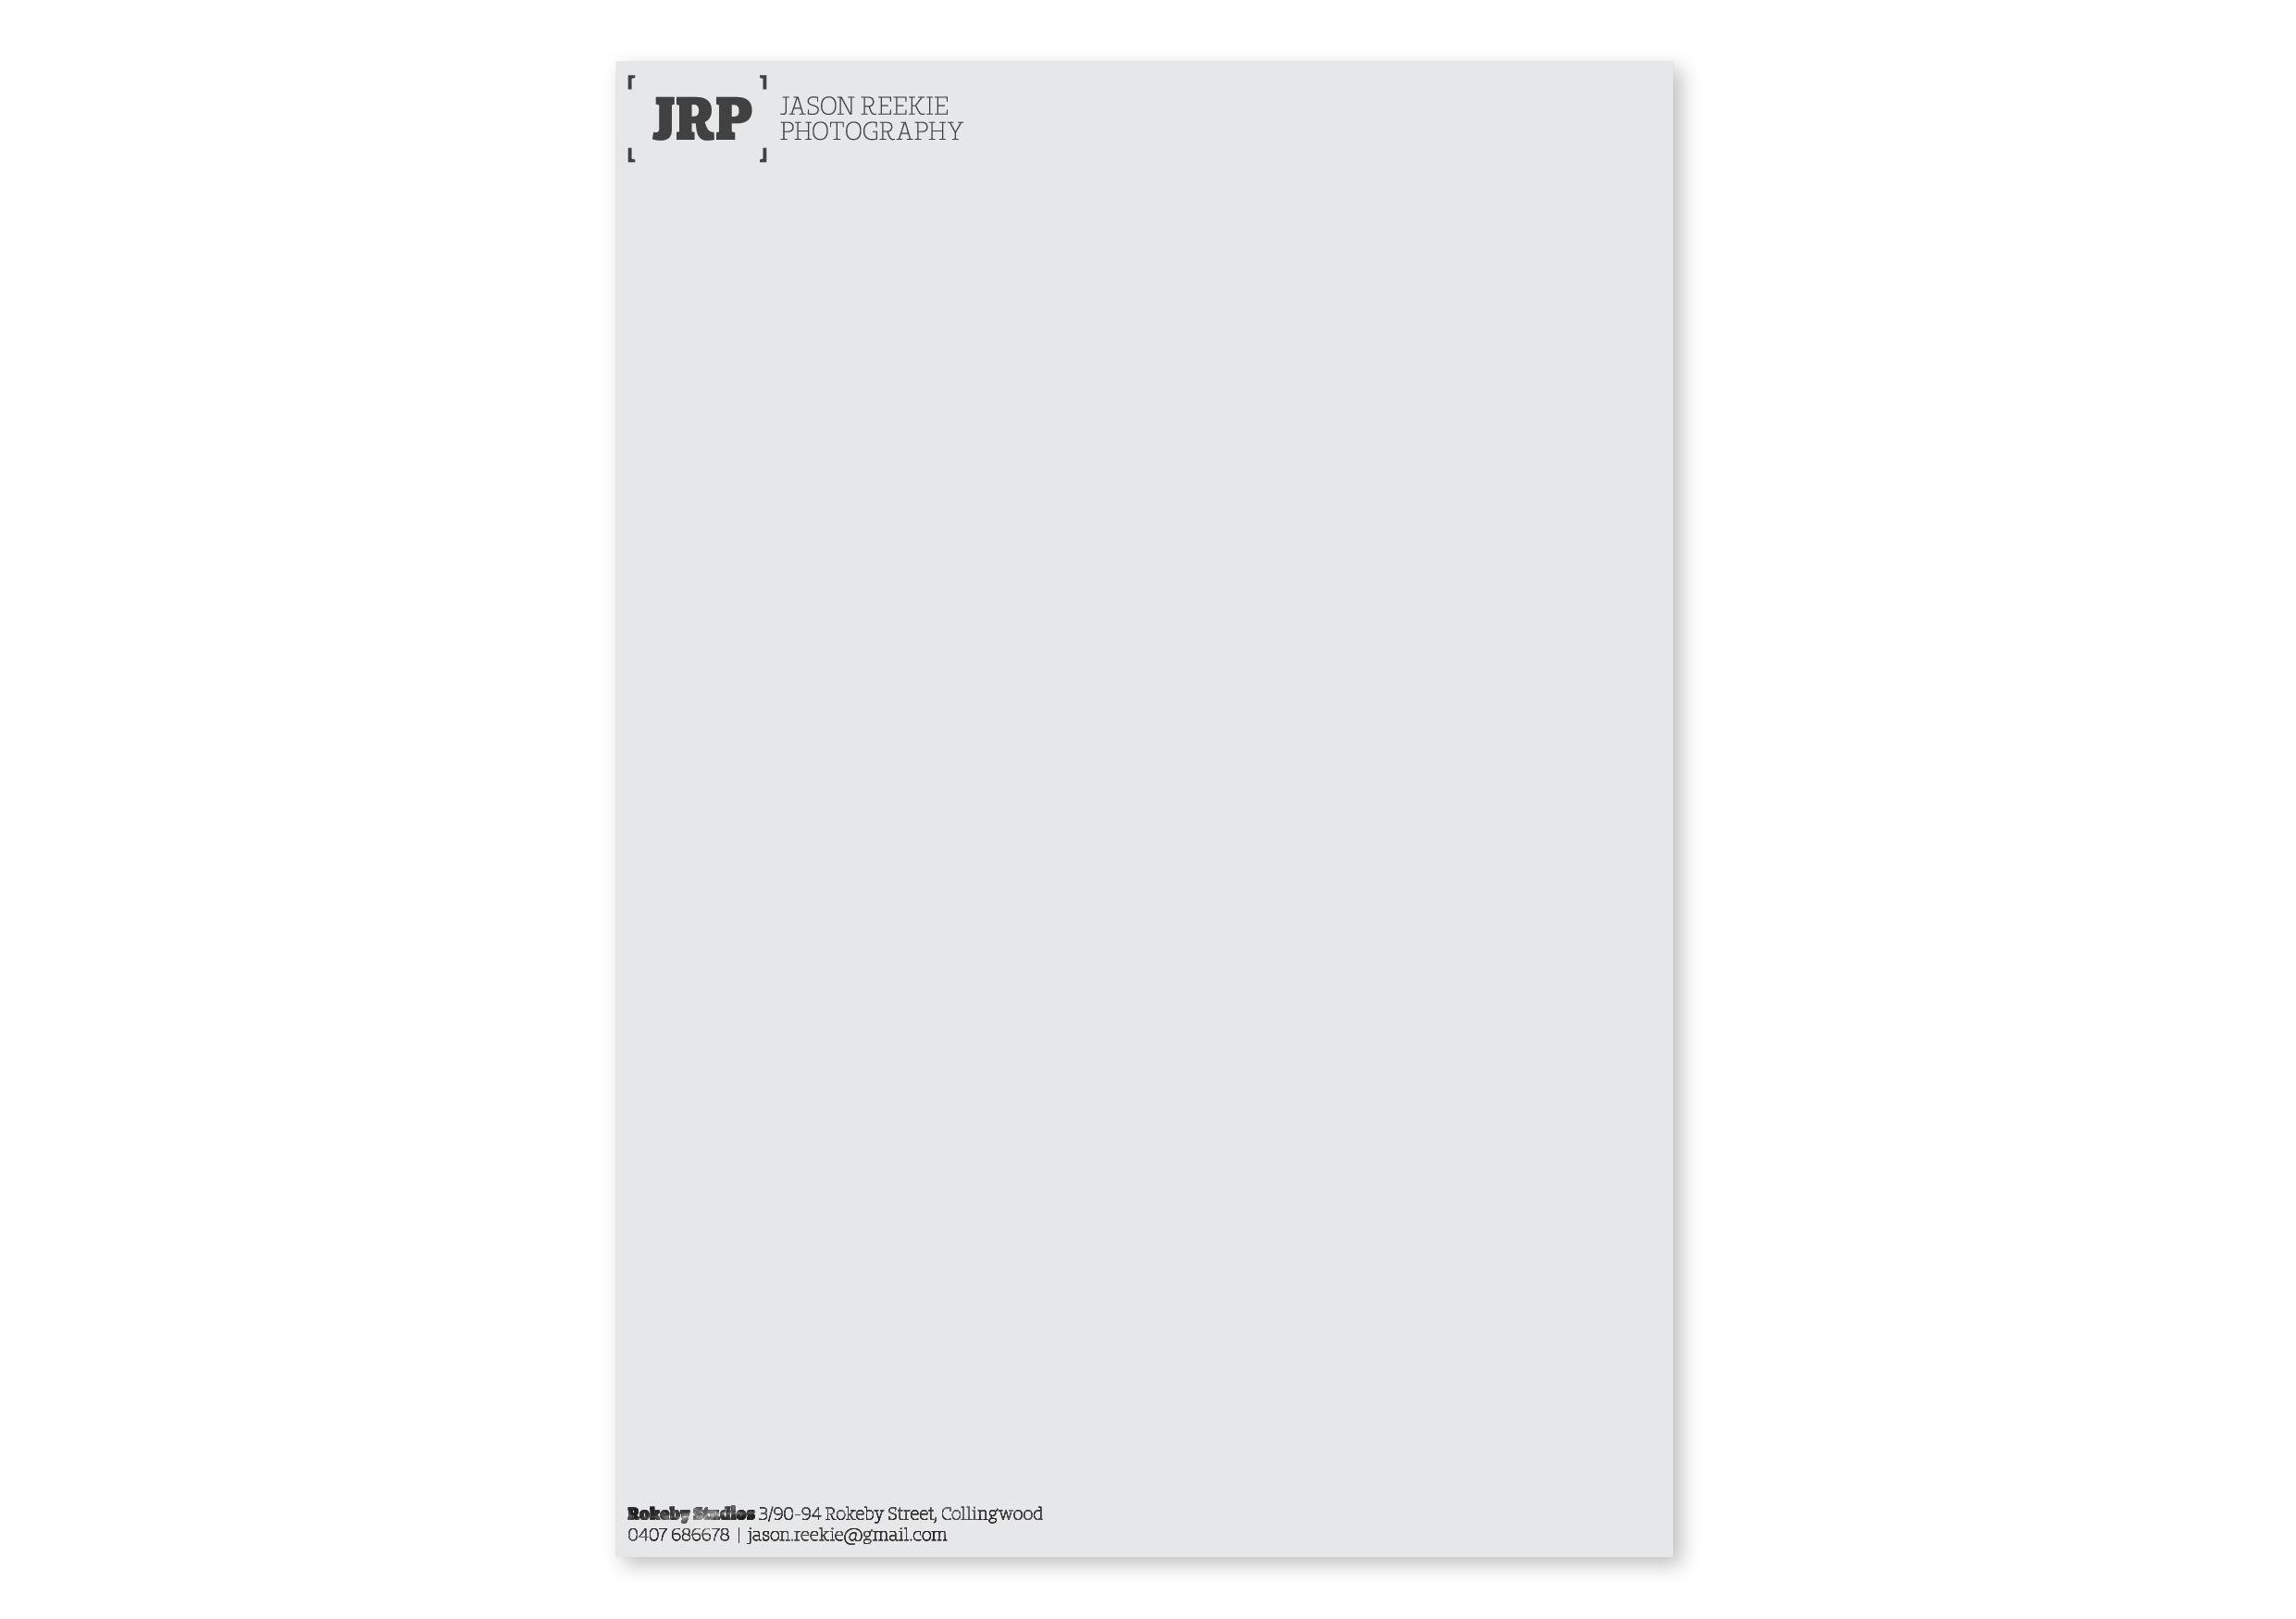 Belinda_Smullen_job_folio3.jpg